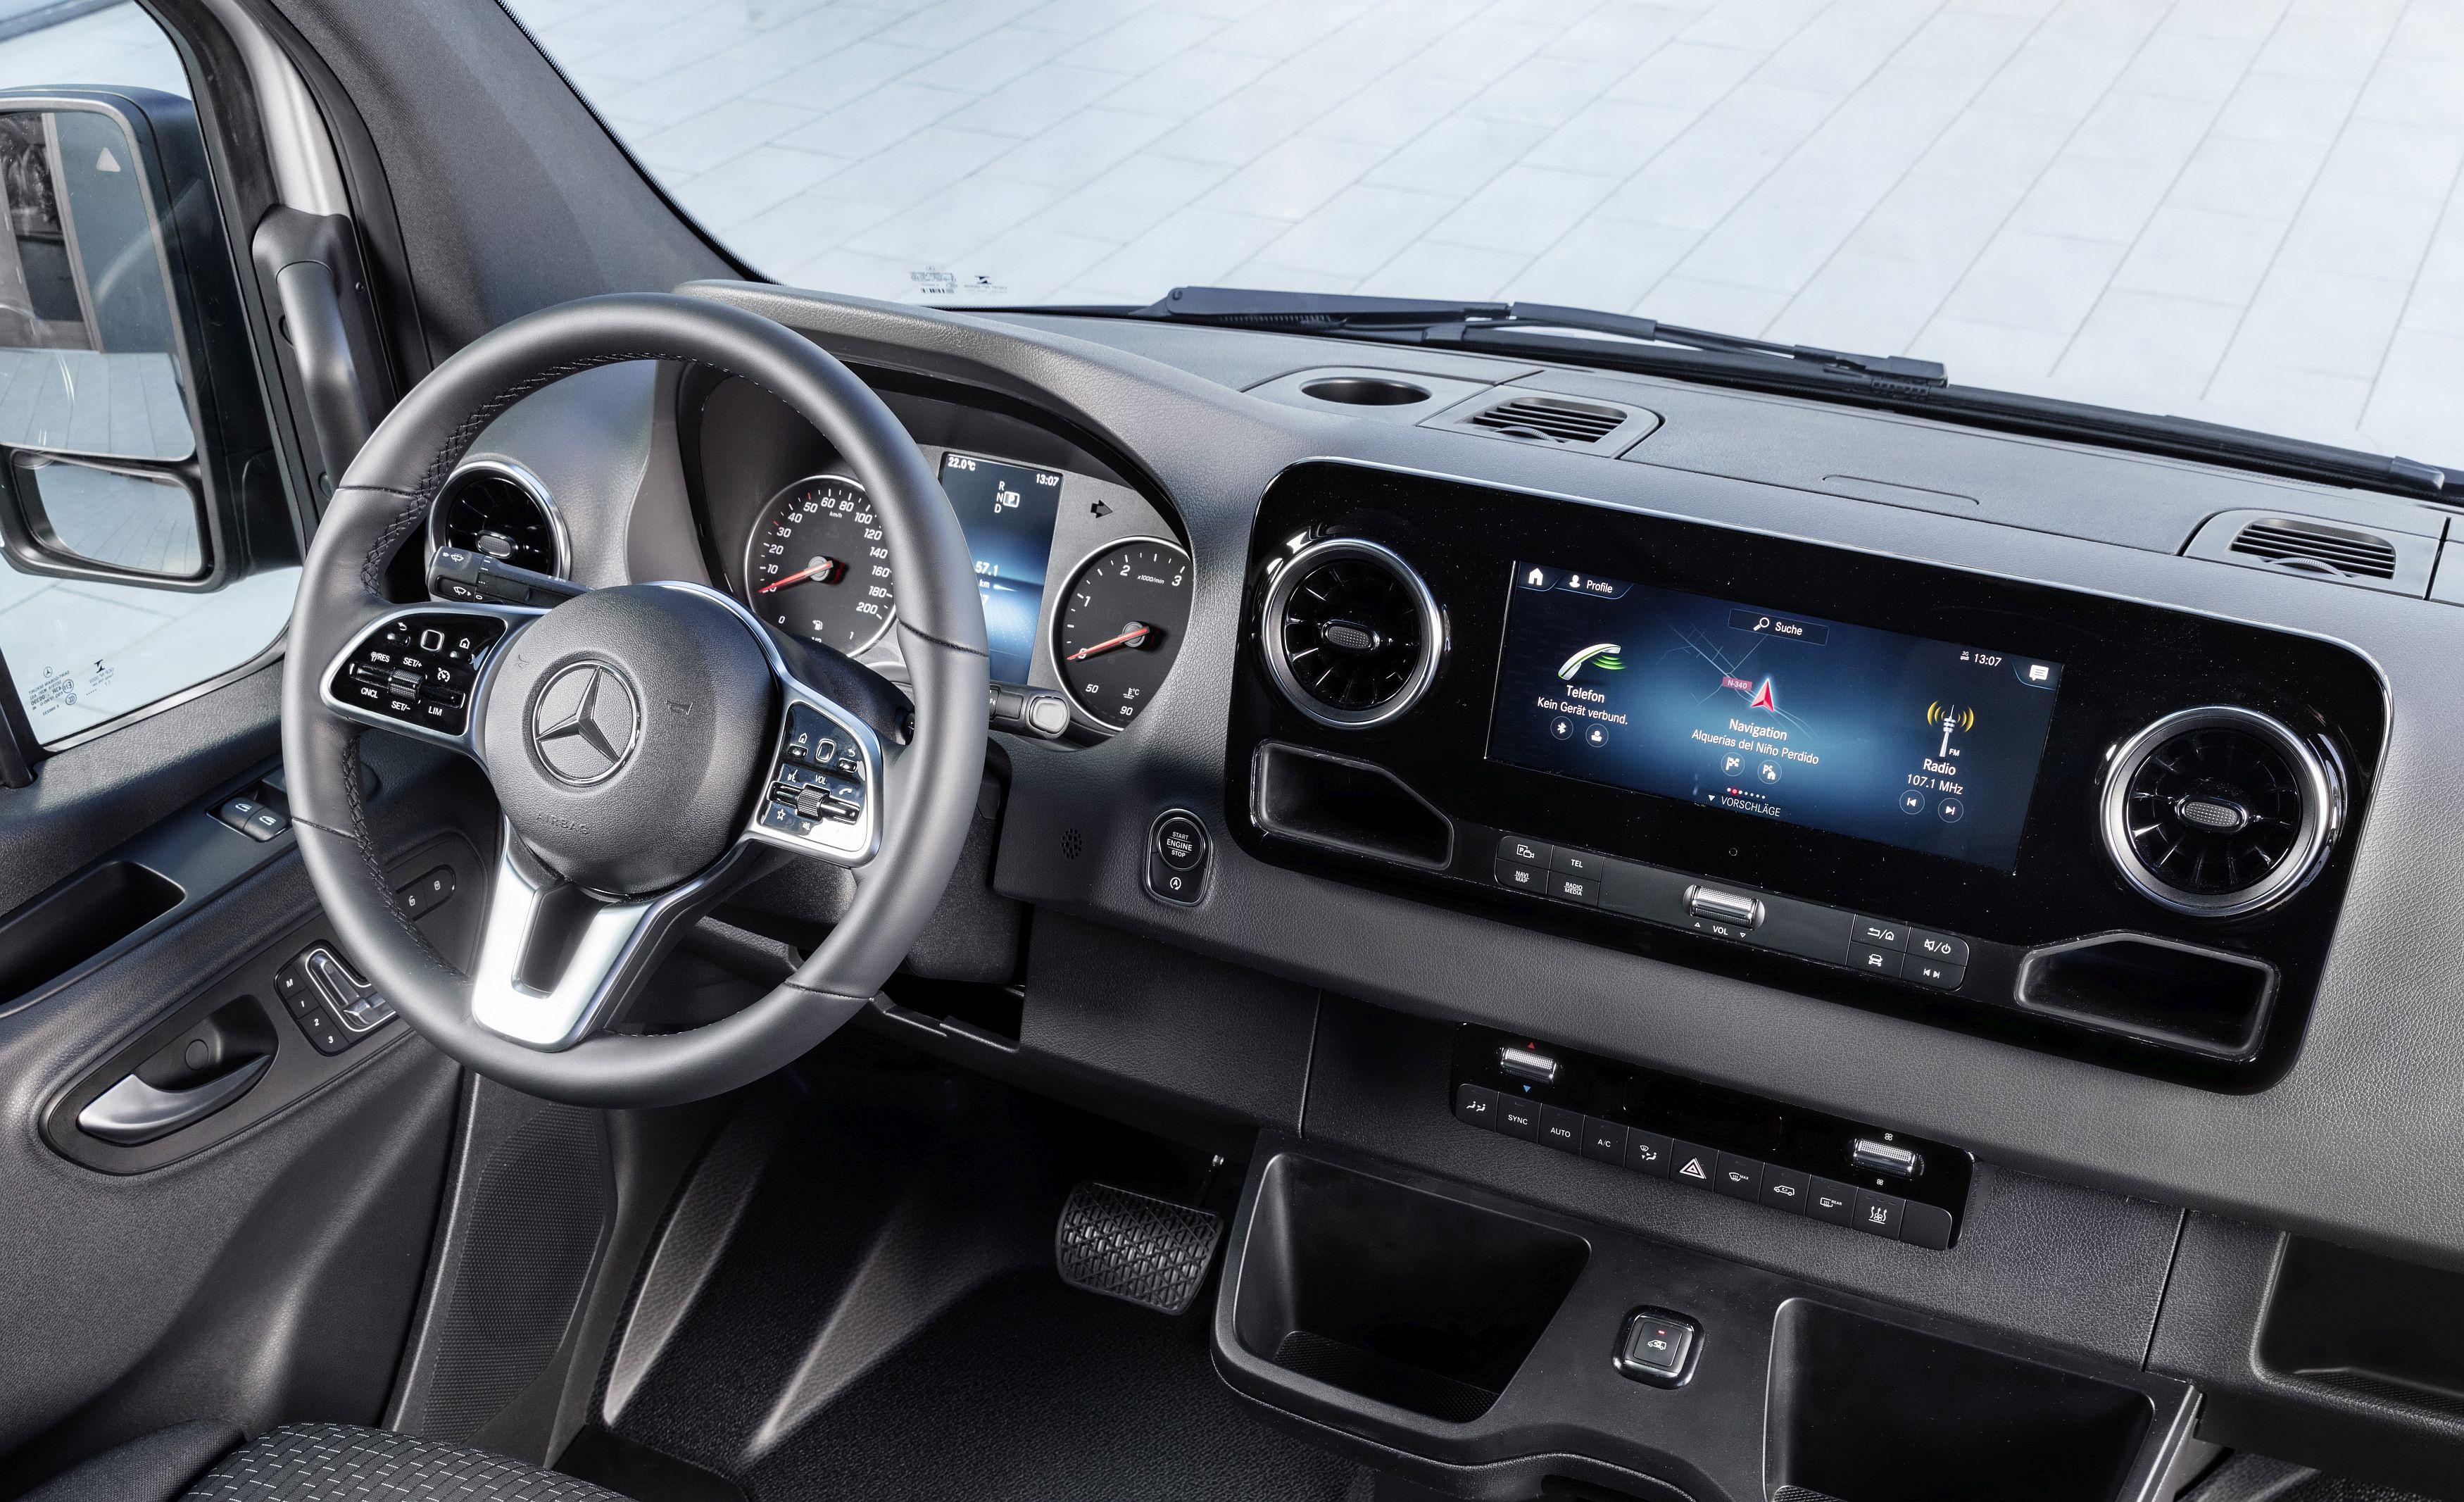 Mercedes-Benz Sprinter – Interieur   Mercedes-Benz Sprinter – Interior